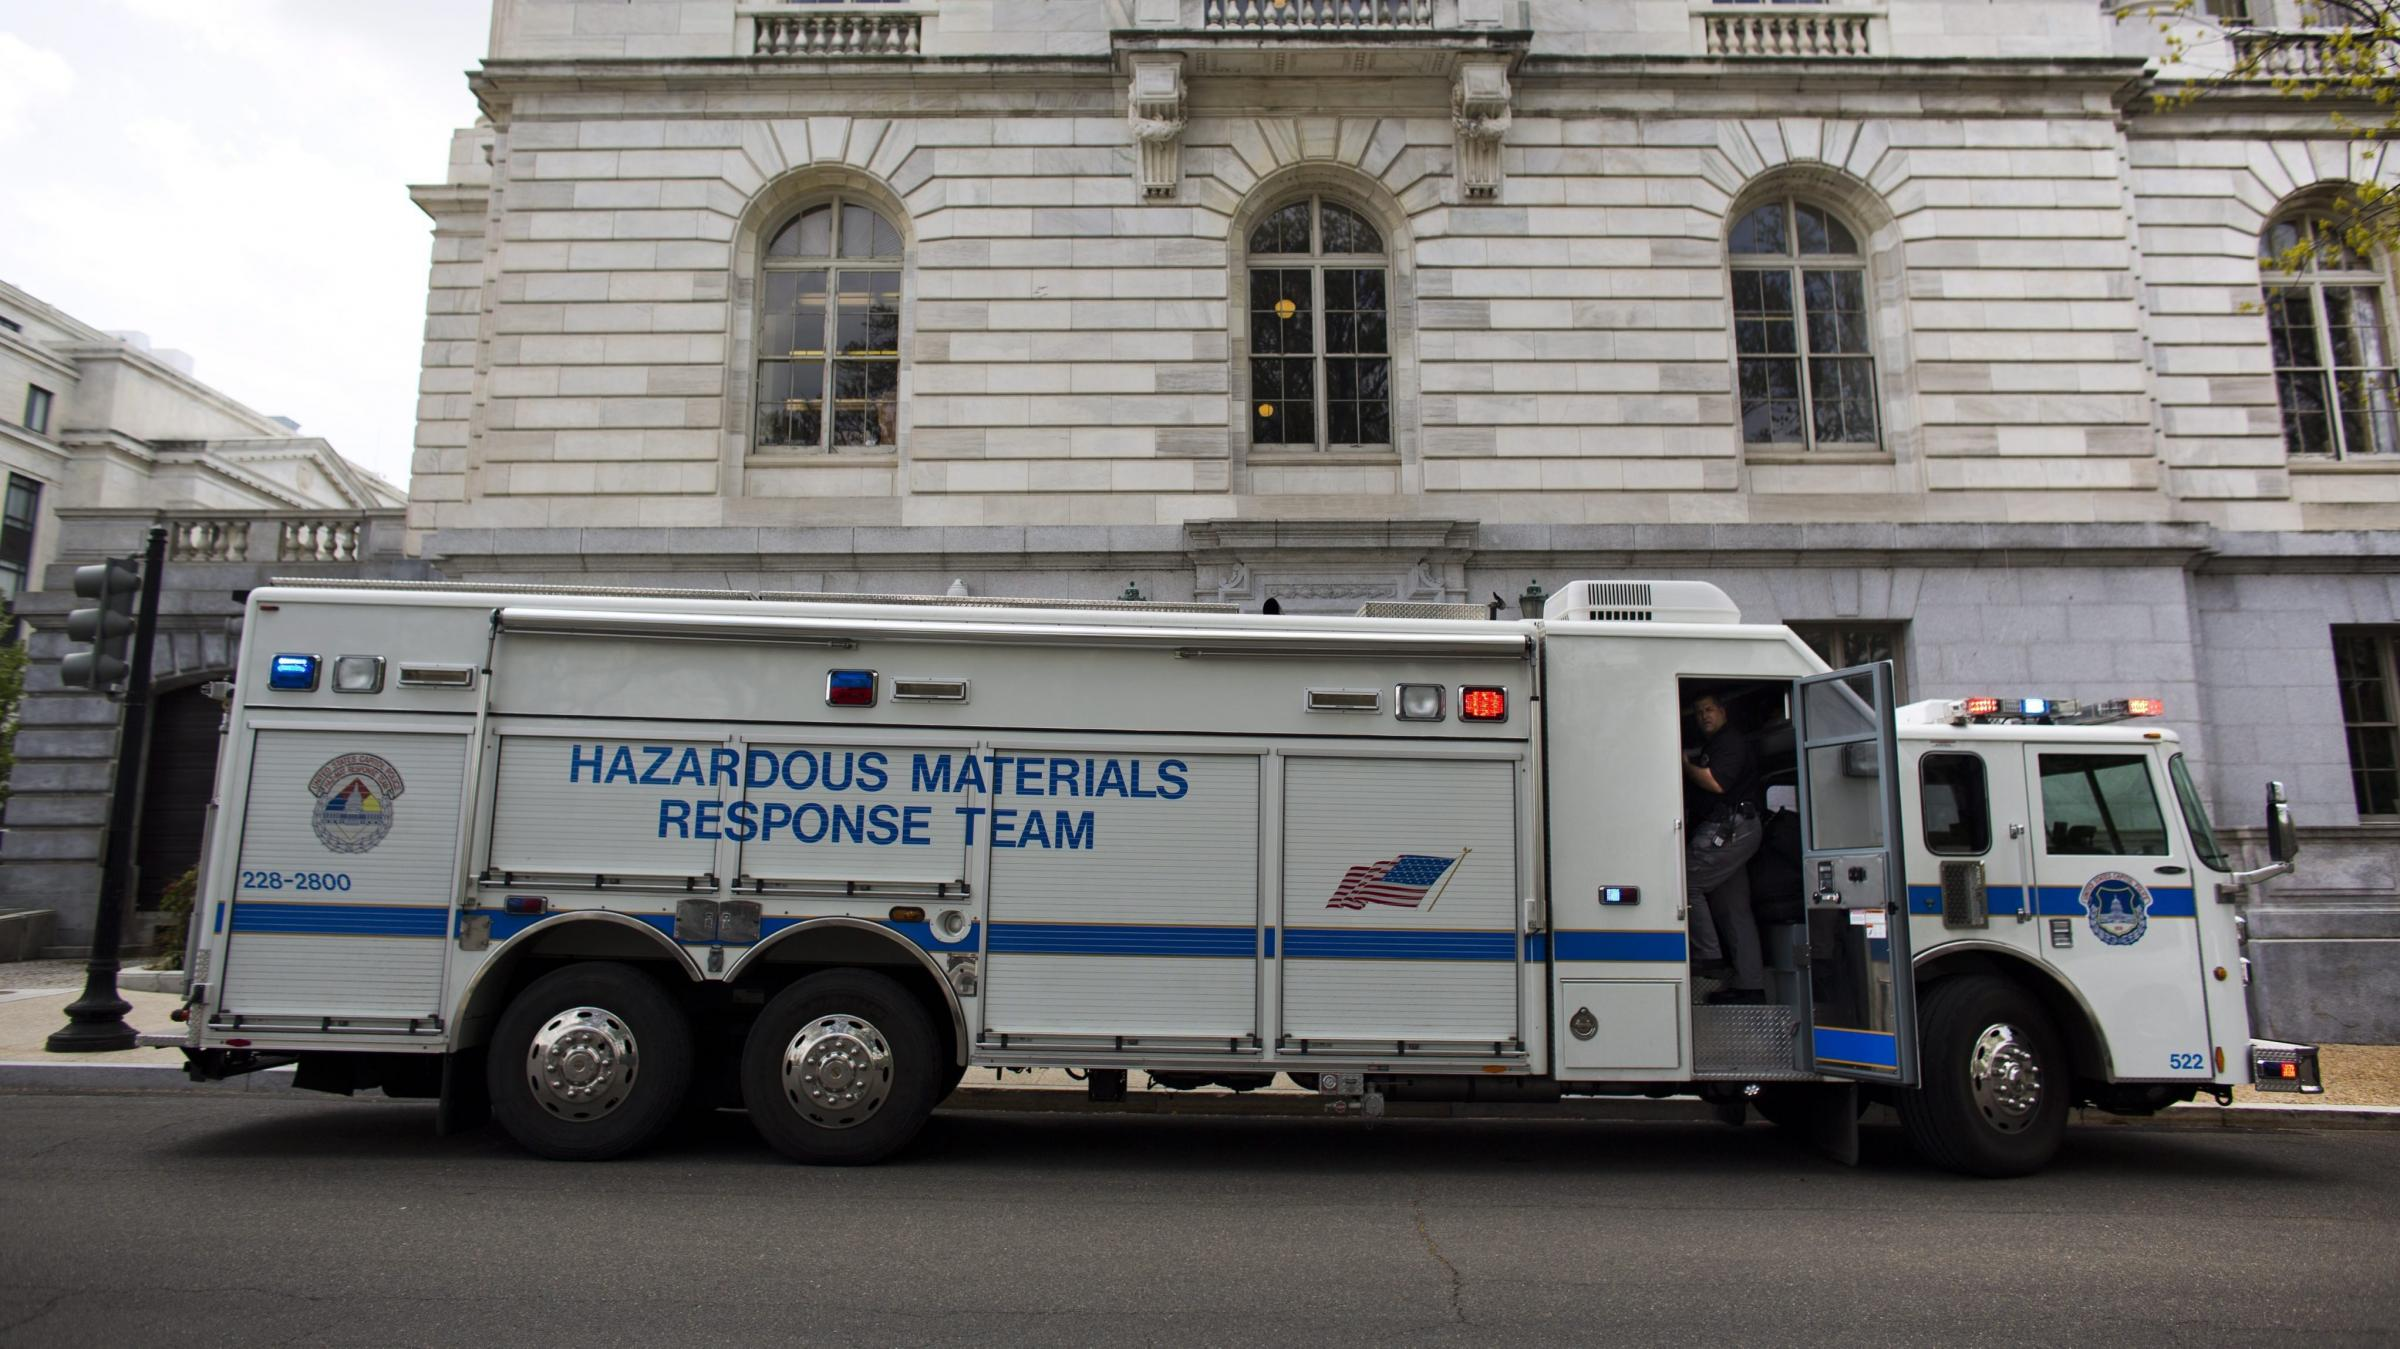 Hazardous Building Material : Authorities make arrest in ricin letters case kut